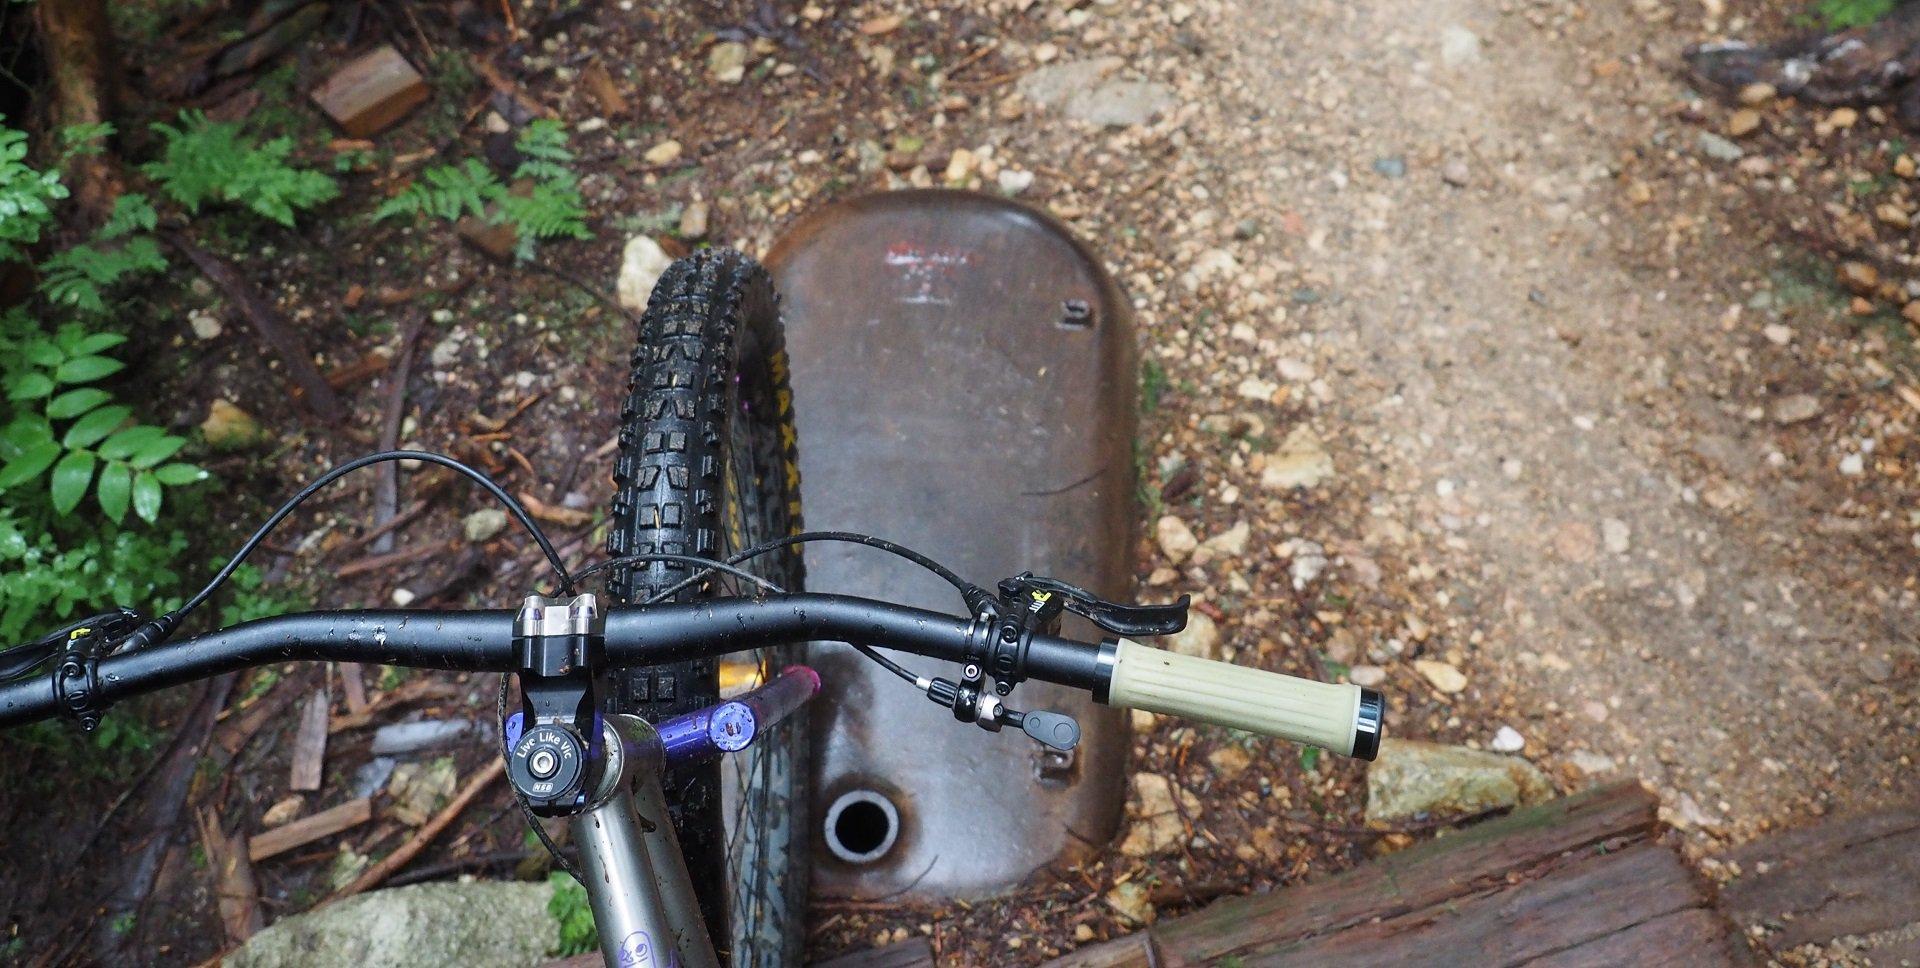 Mountain Bike Road Bicycle Handlebar 31.8mm 700mm Extra Long 50mm Big Riser Bar